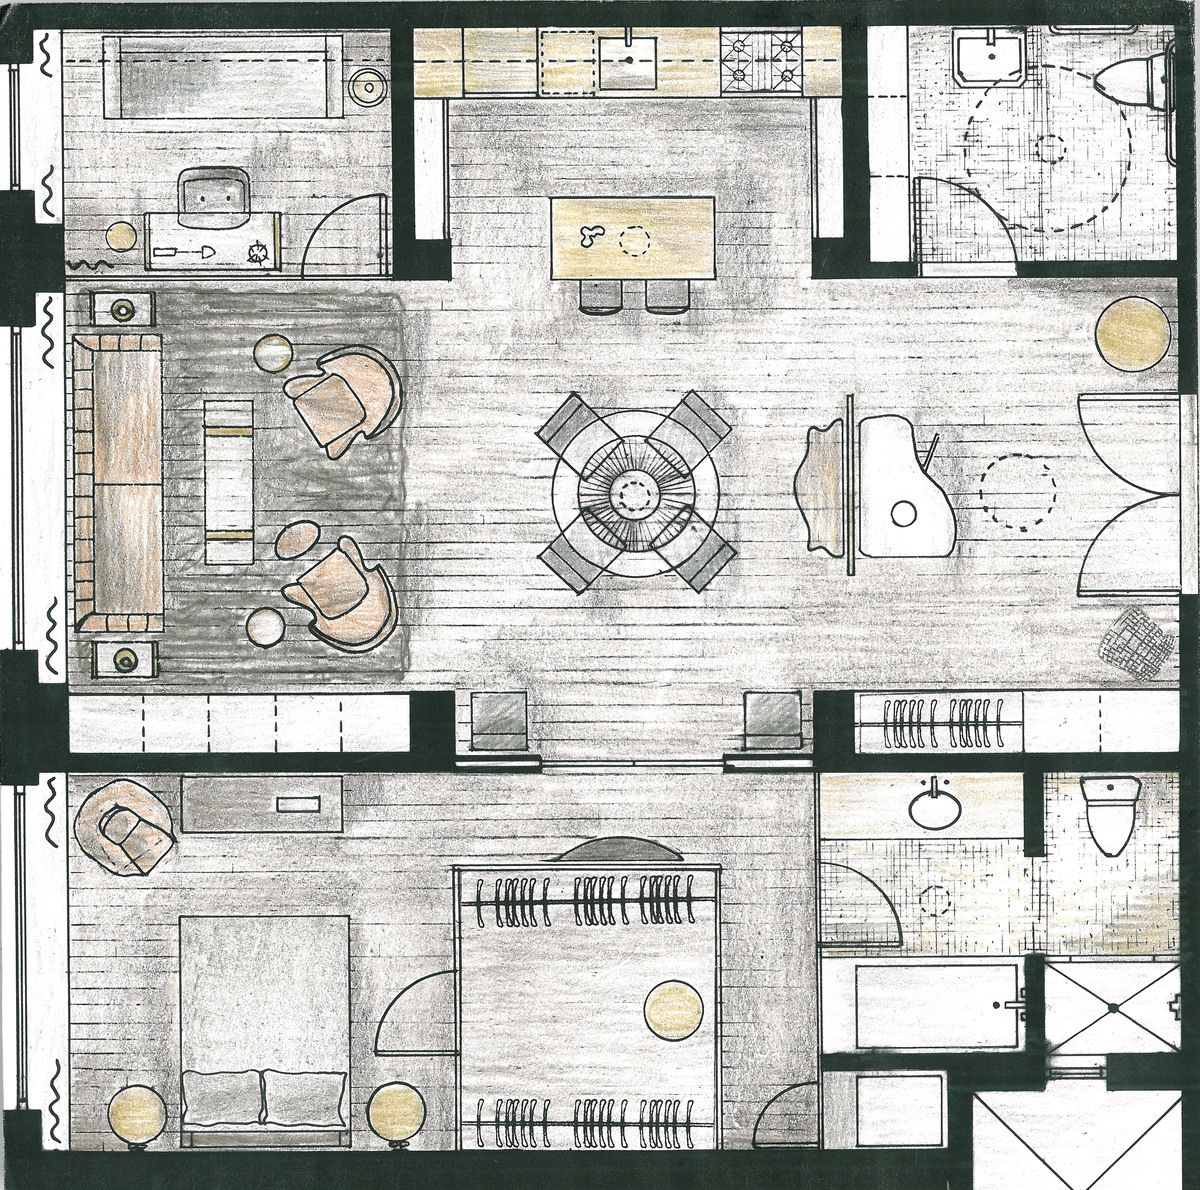 Interior Design Layout: RESIDENTIAL LOFT